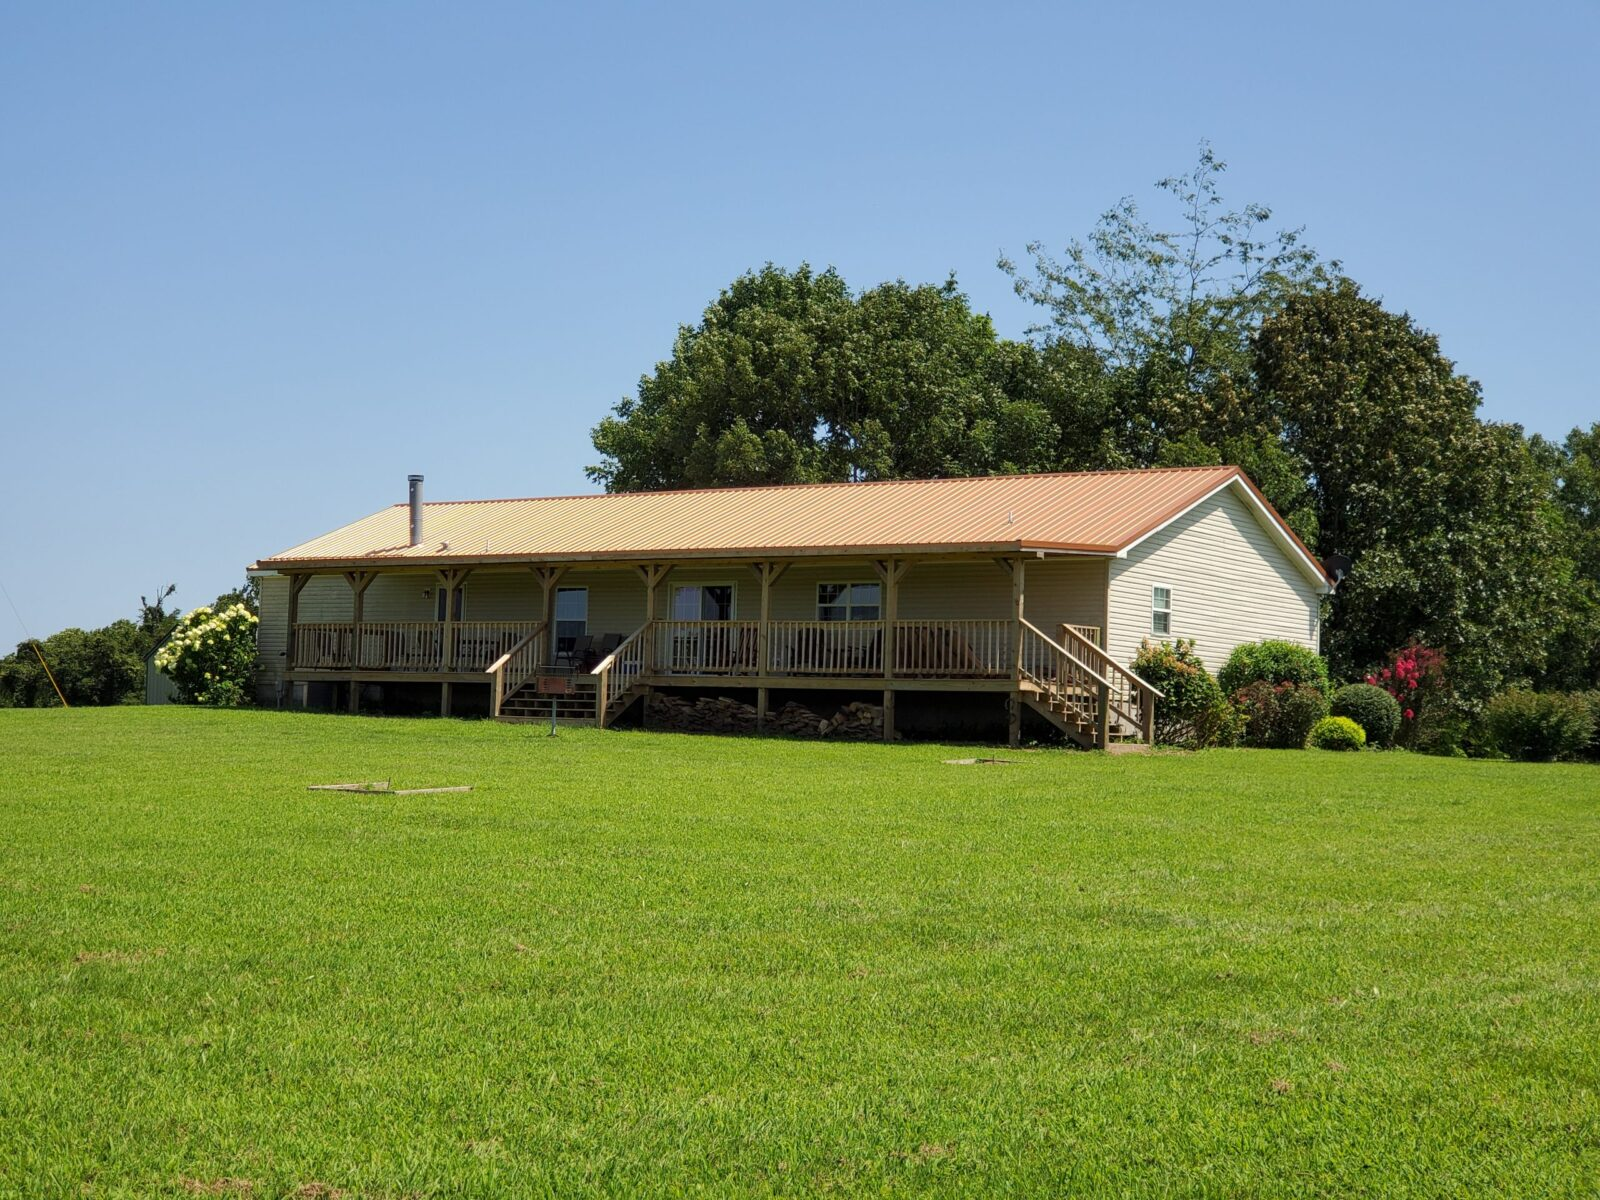 Pet Friendly Home Rental in Shawnee Forest